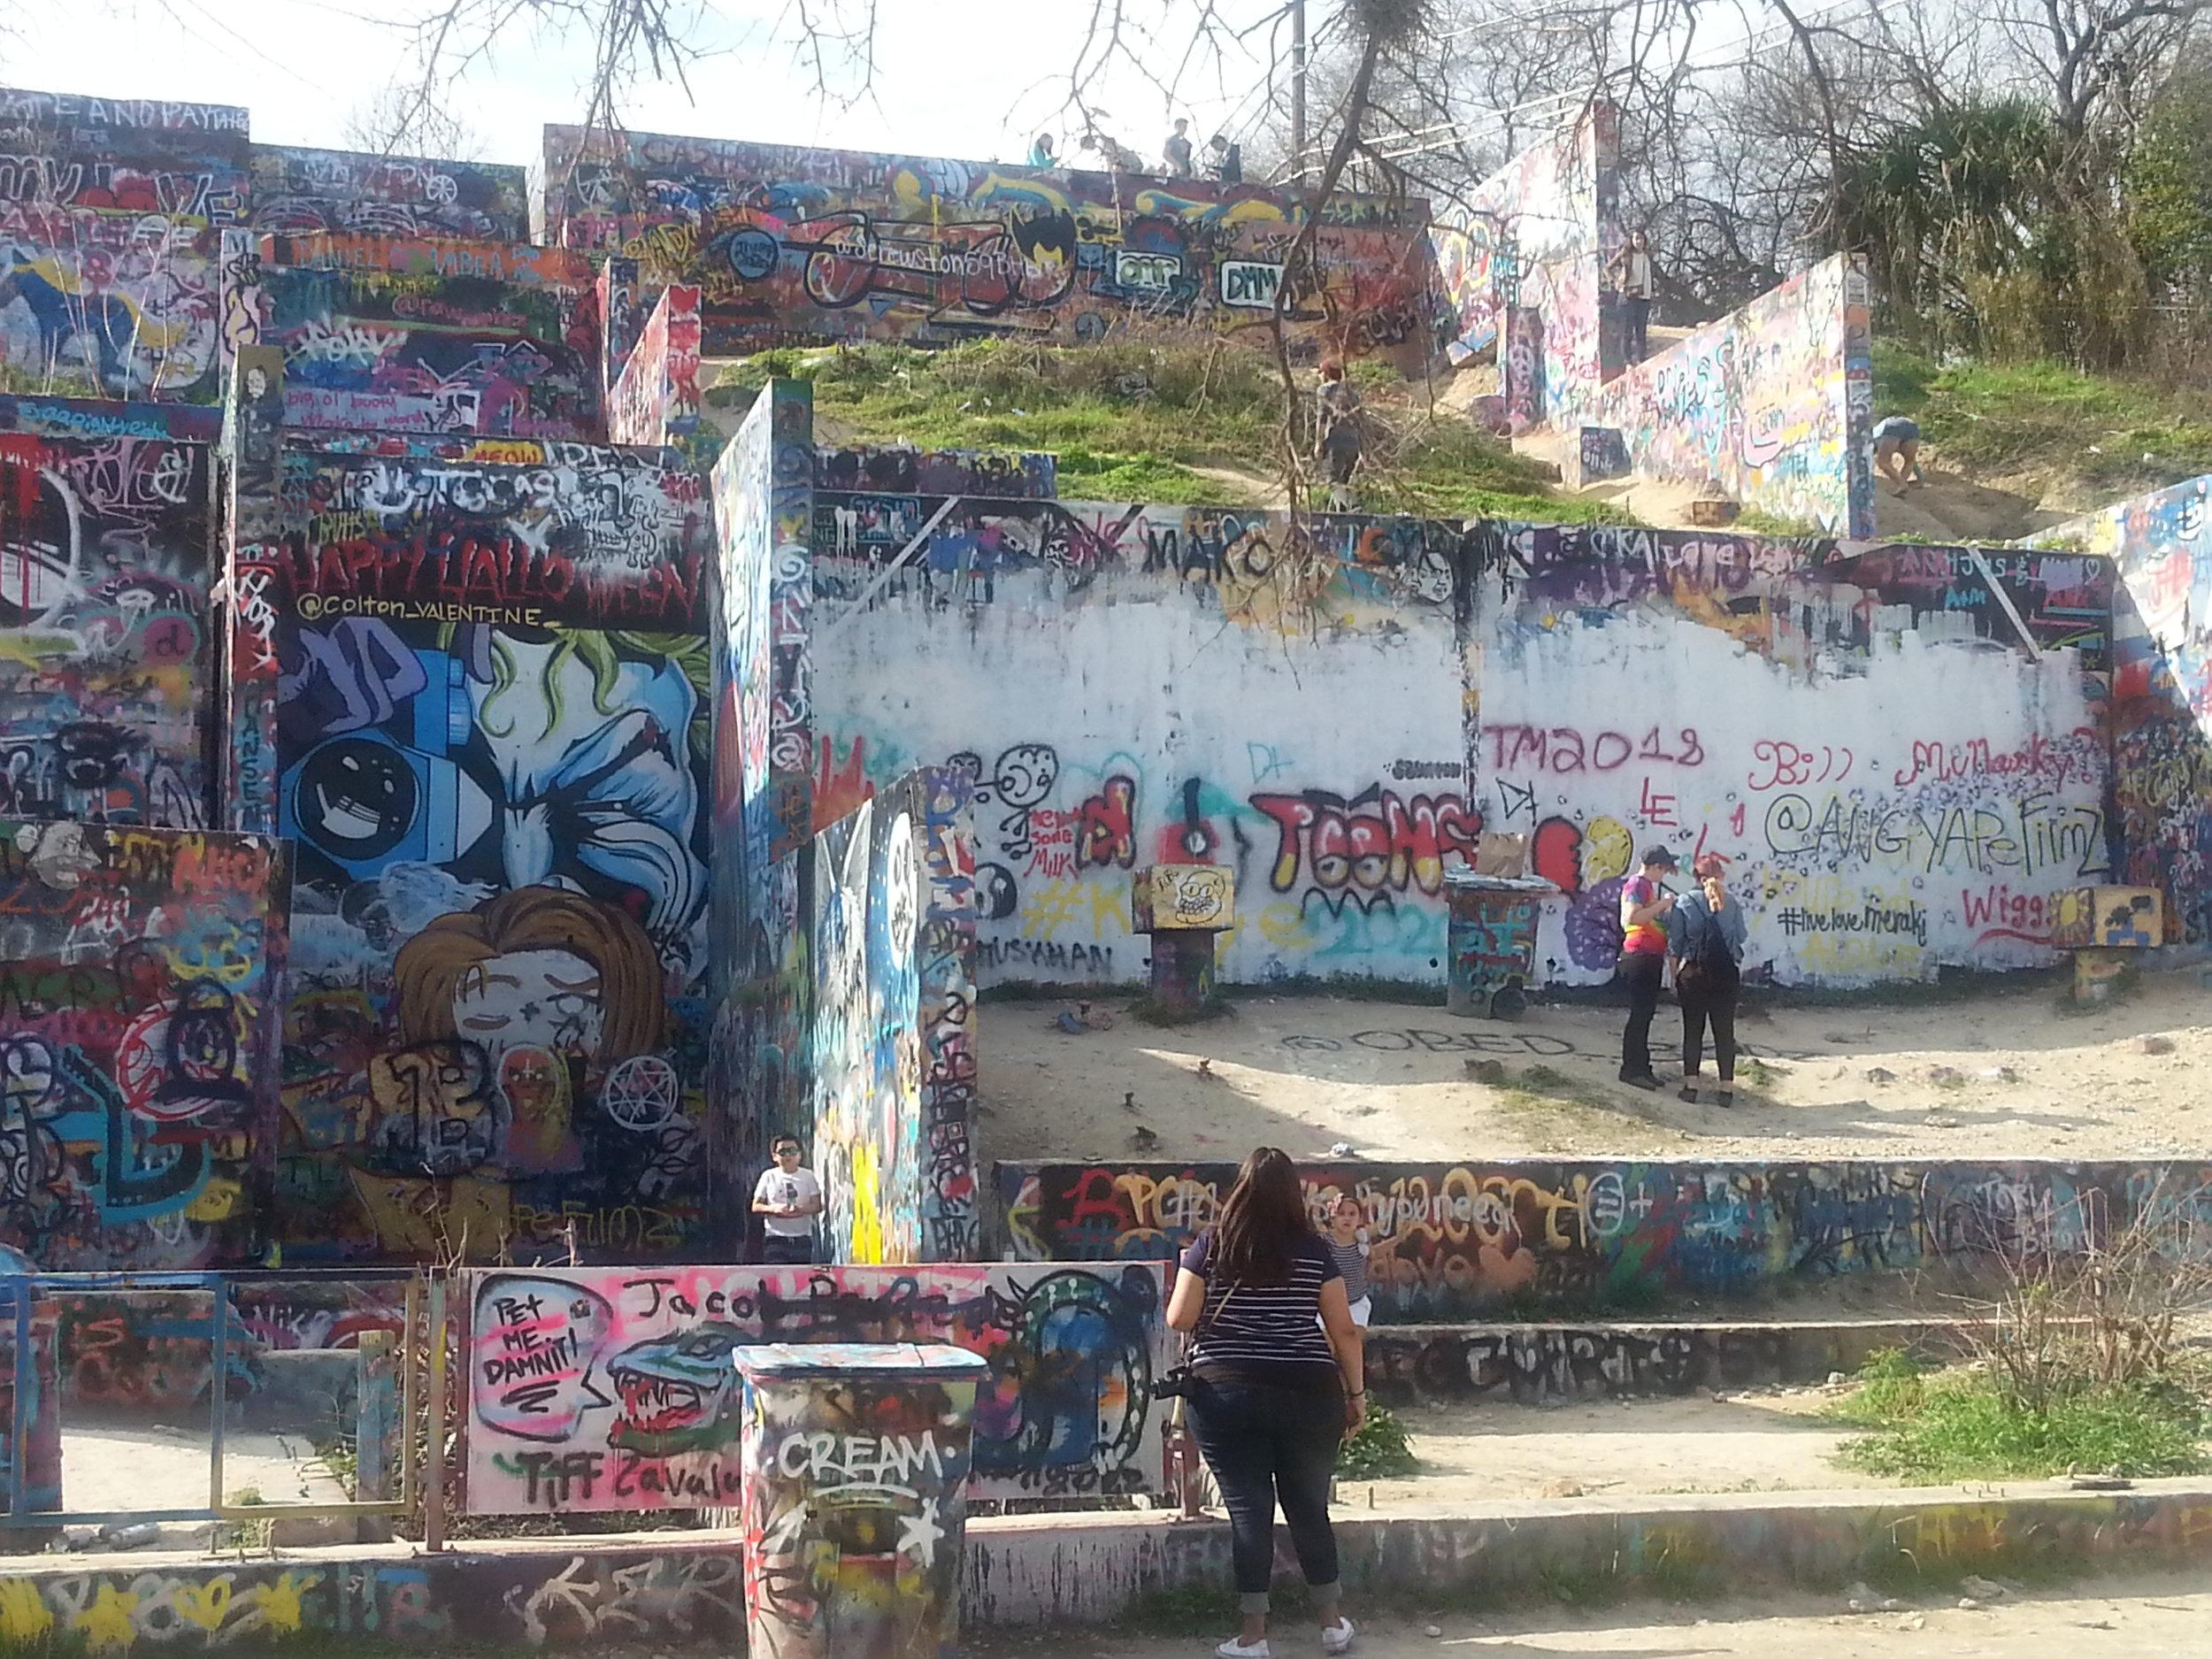 Hope Outdoor Gallery, Austin, Texas (picture: Brent Petersen)